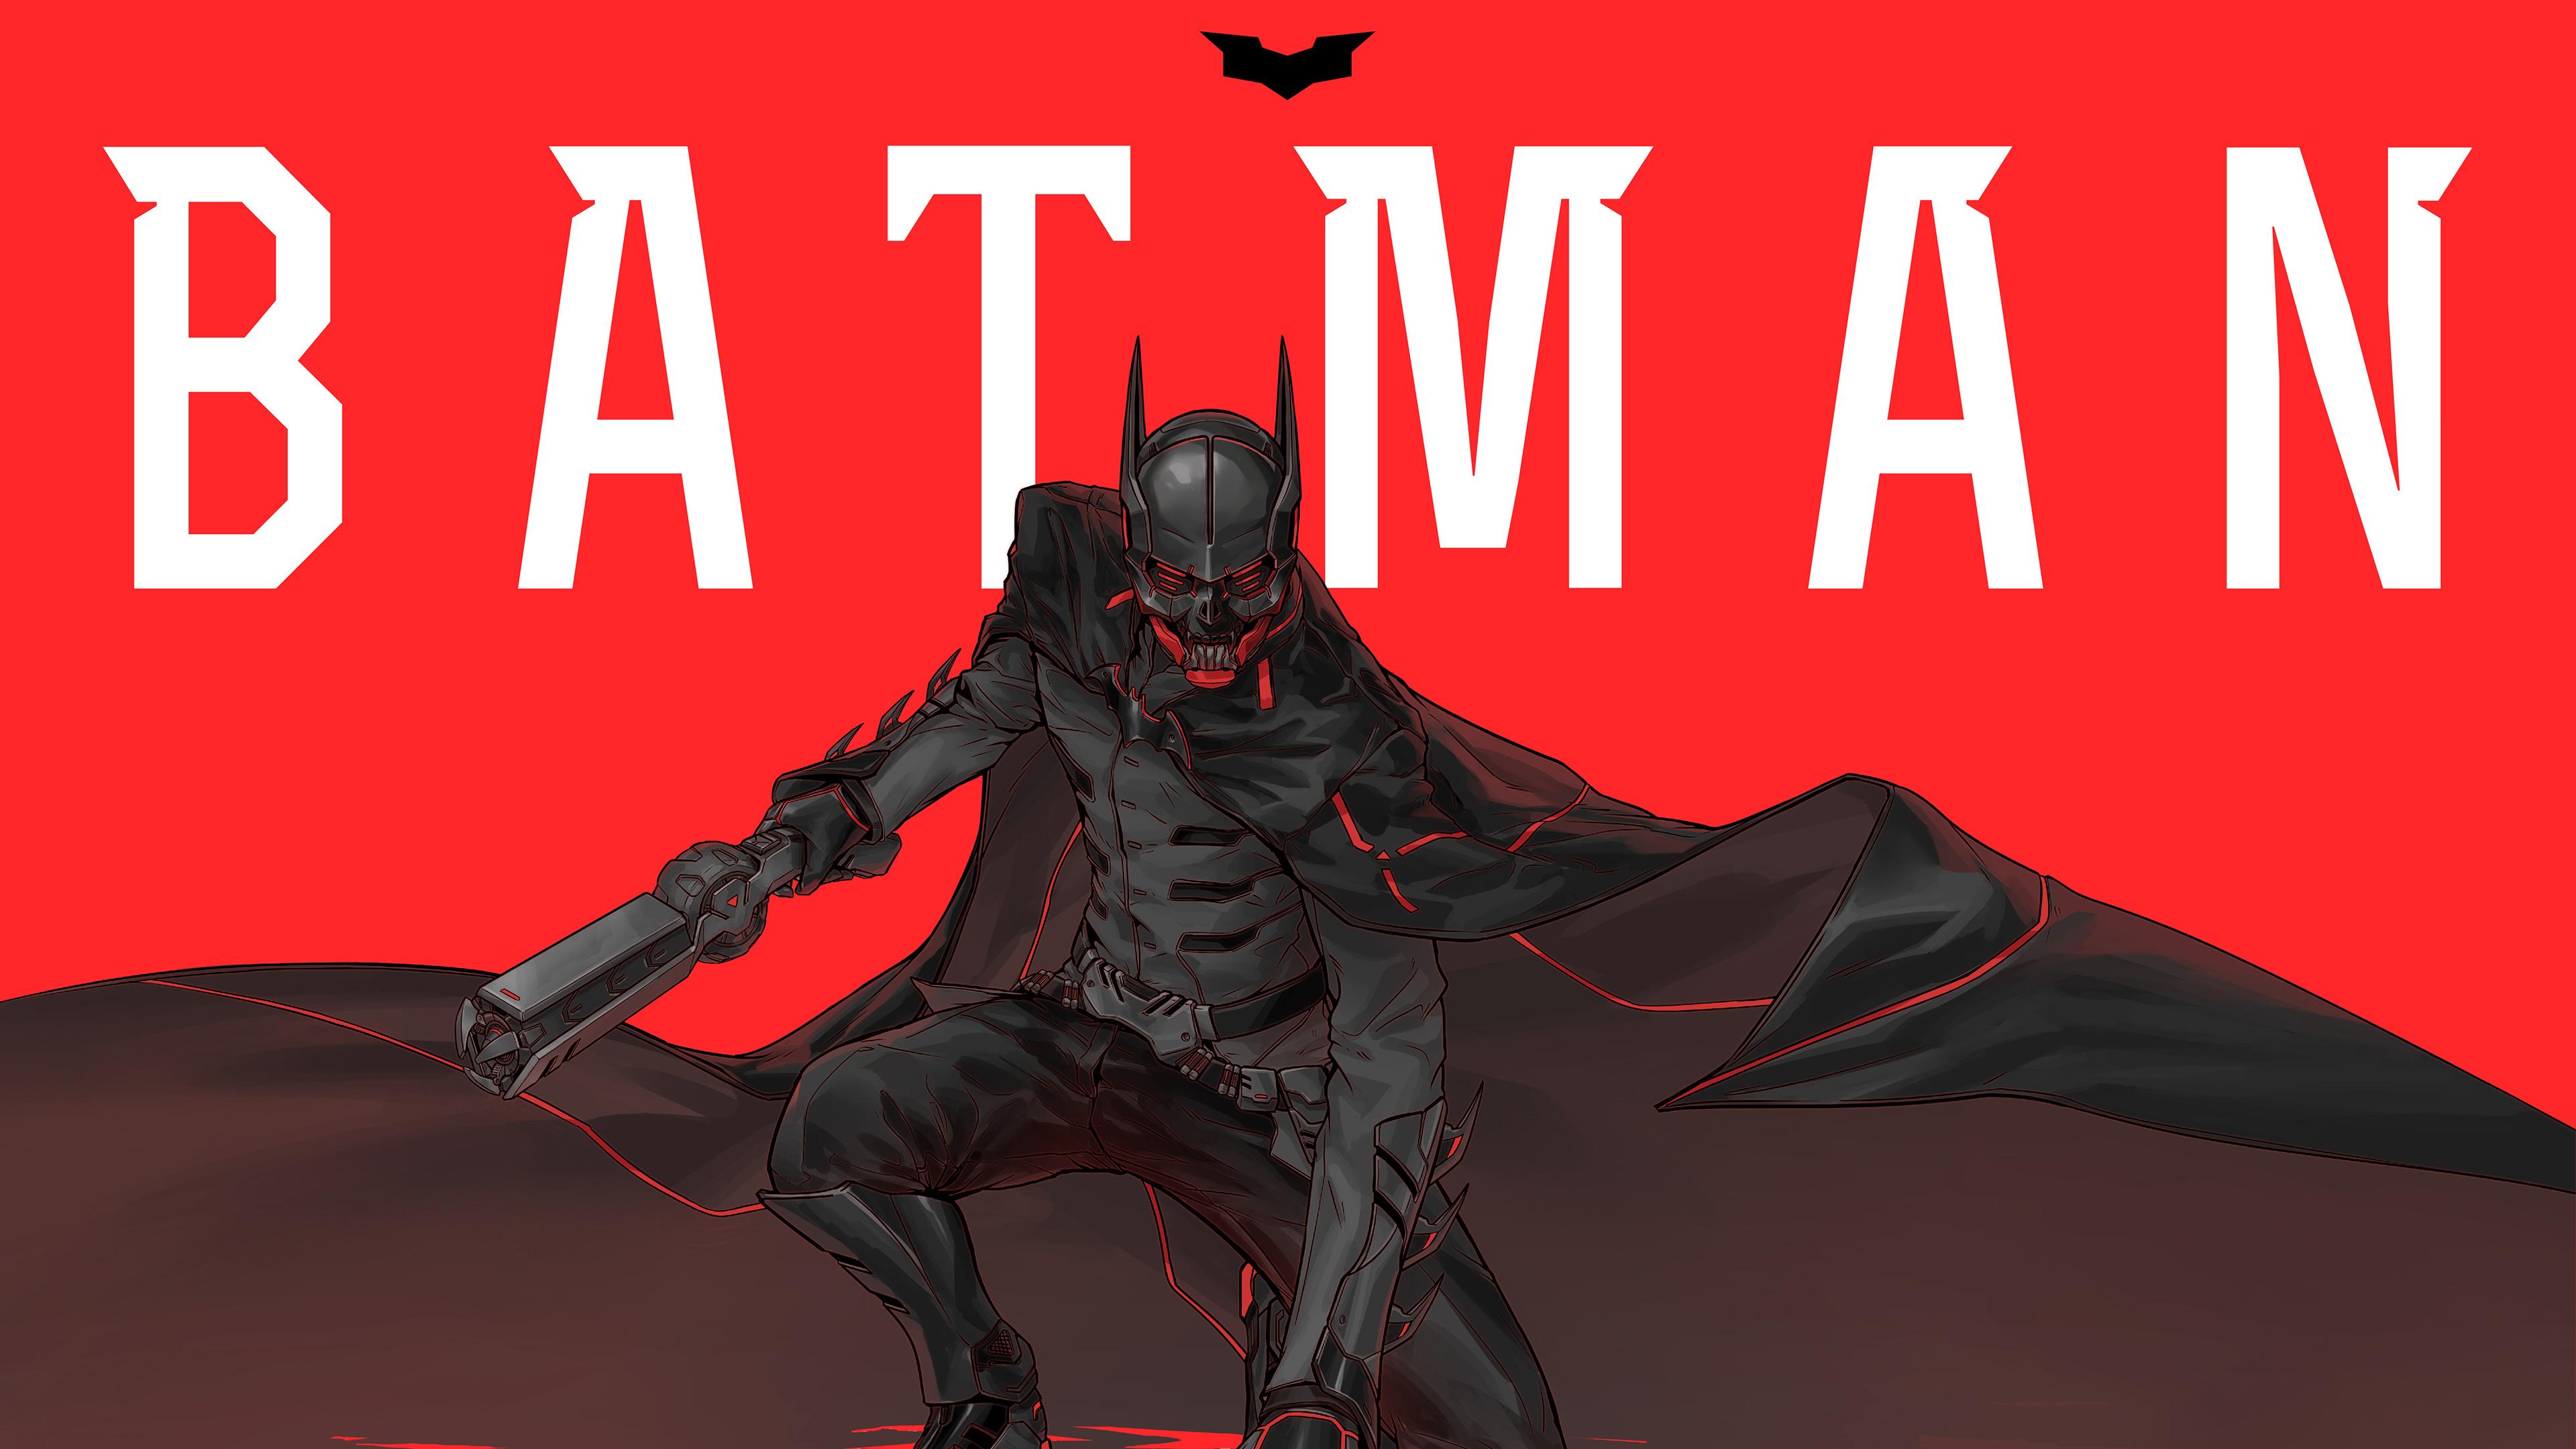 batman 4k arts 1541294414 - Batman 4k Arts - superheroes wallpapers, hd-wallpapers, digital art wallpapers, behance wallpapers, batman wallpapers, artwork wallpapers, artist wallpapers, 4k-wallpapers